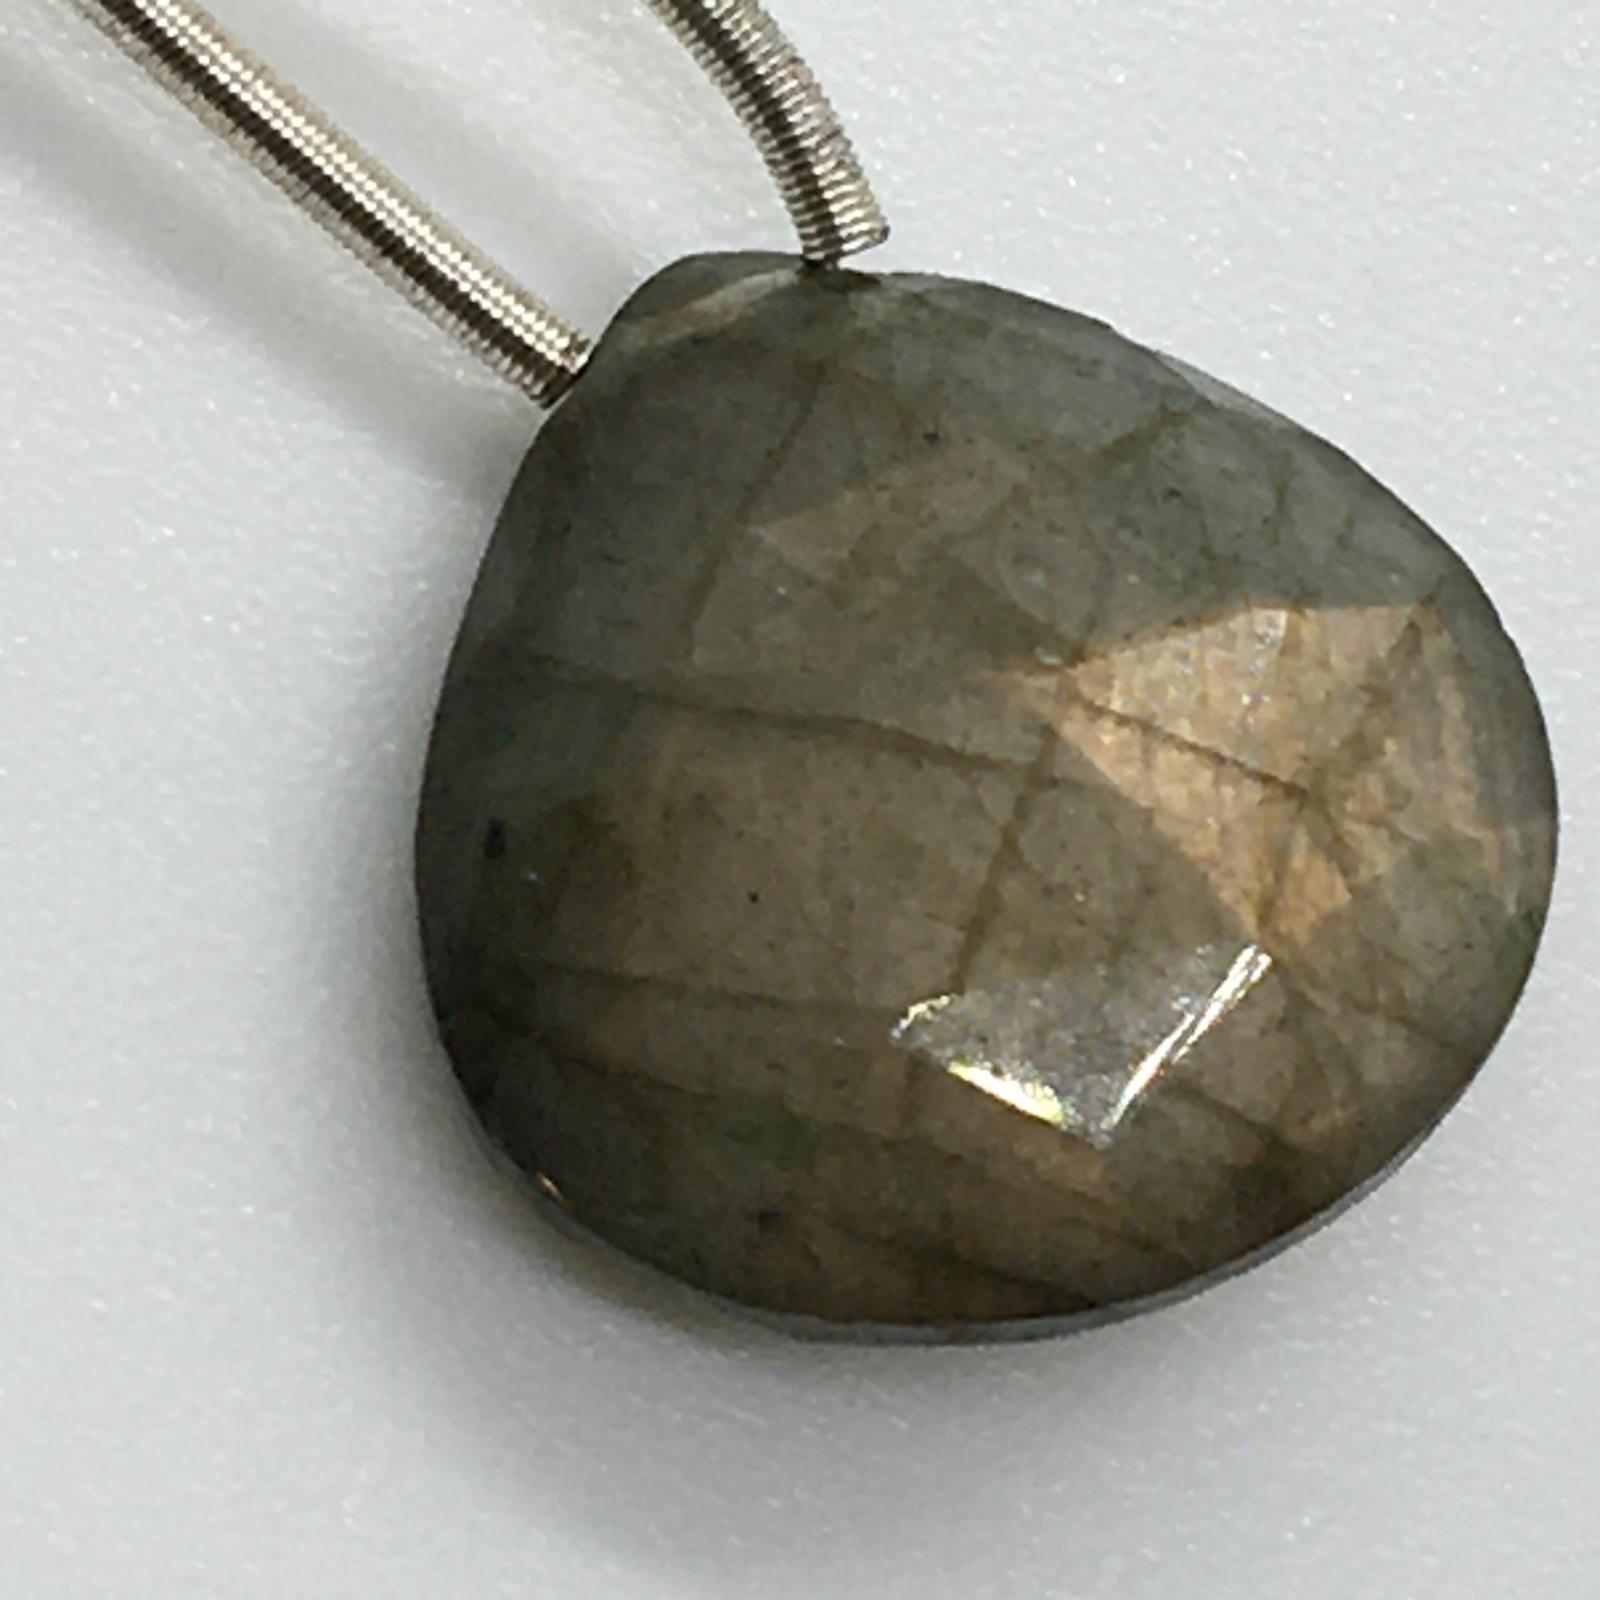 Labradorite faceted brio pendant approx 12gm